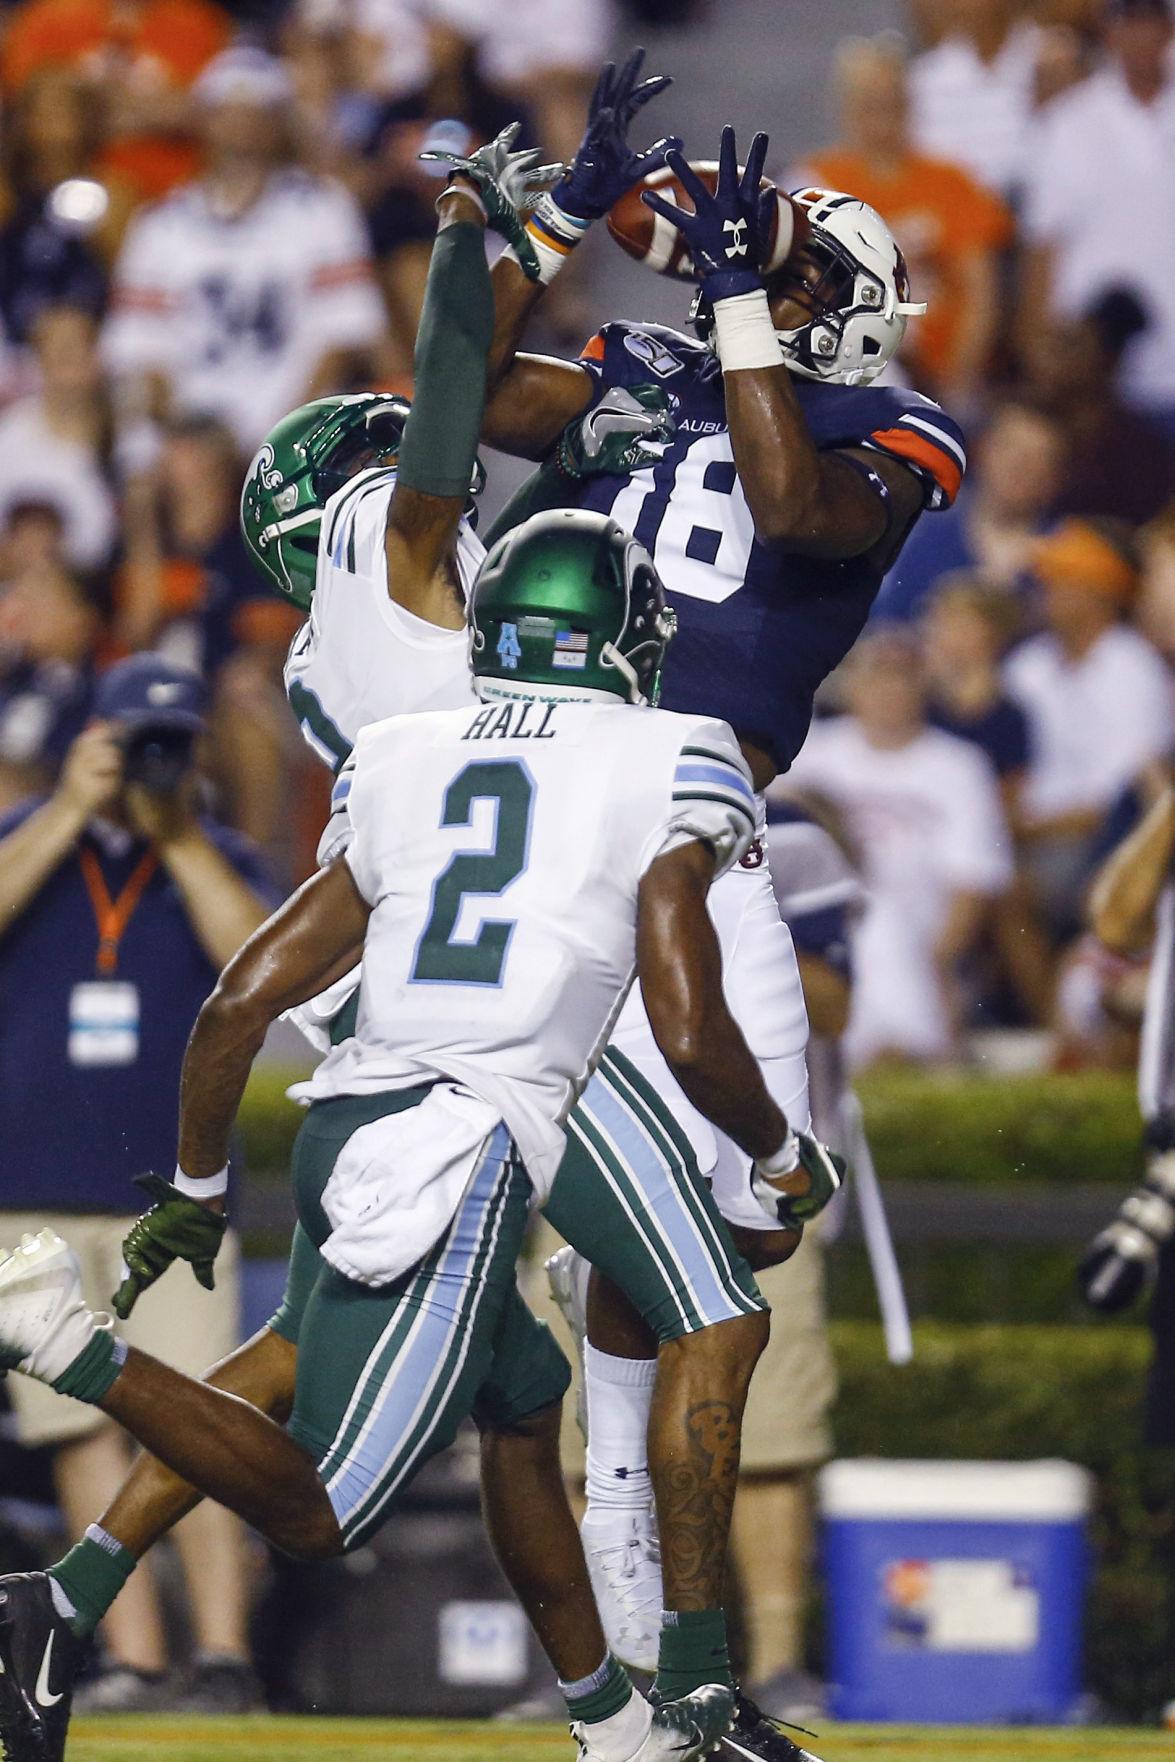 Auburn 24, Tulane 6: Tigers win, still lack offensive spark